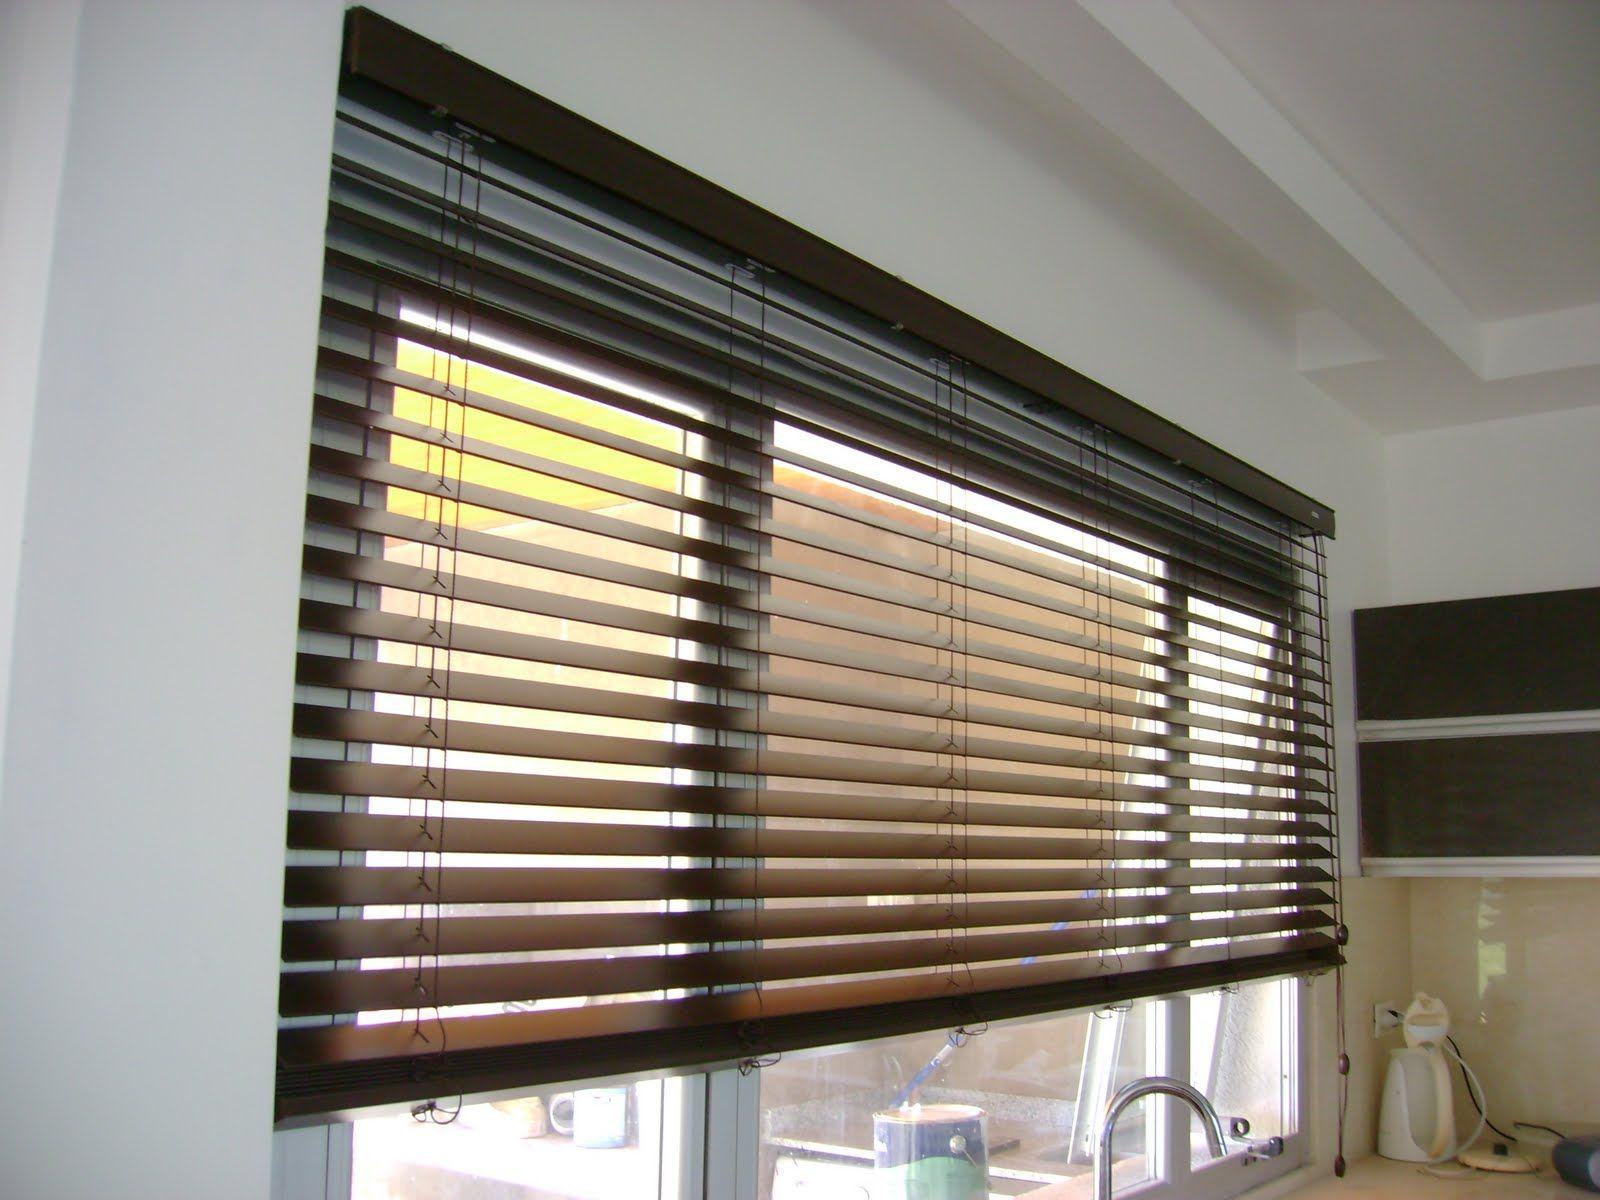 cortina veneciana de lamas horizontales en madera o